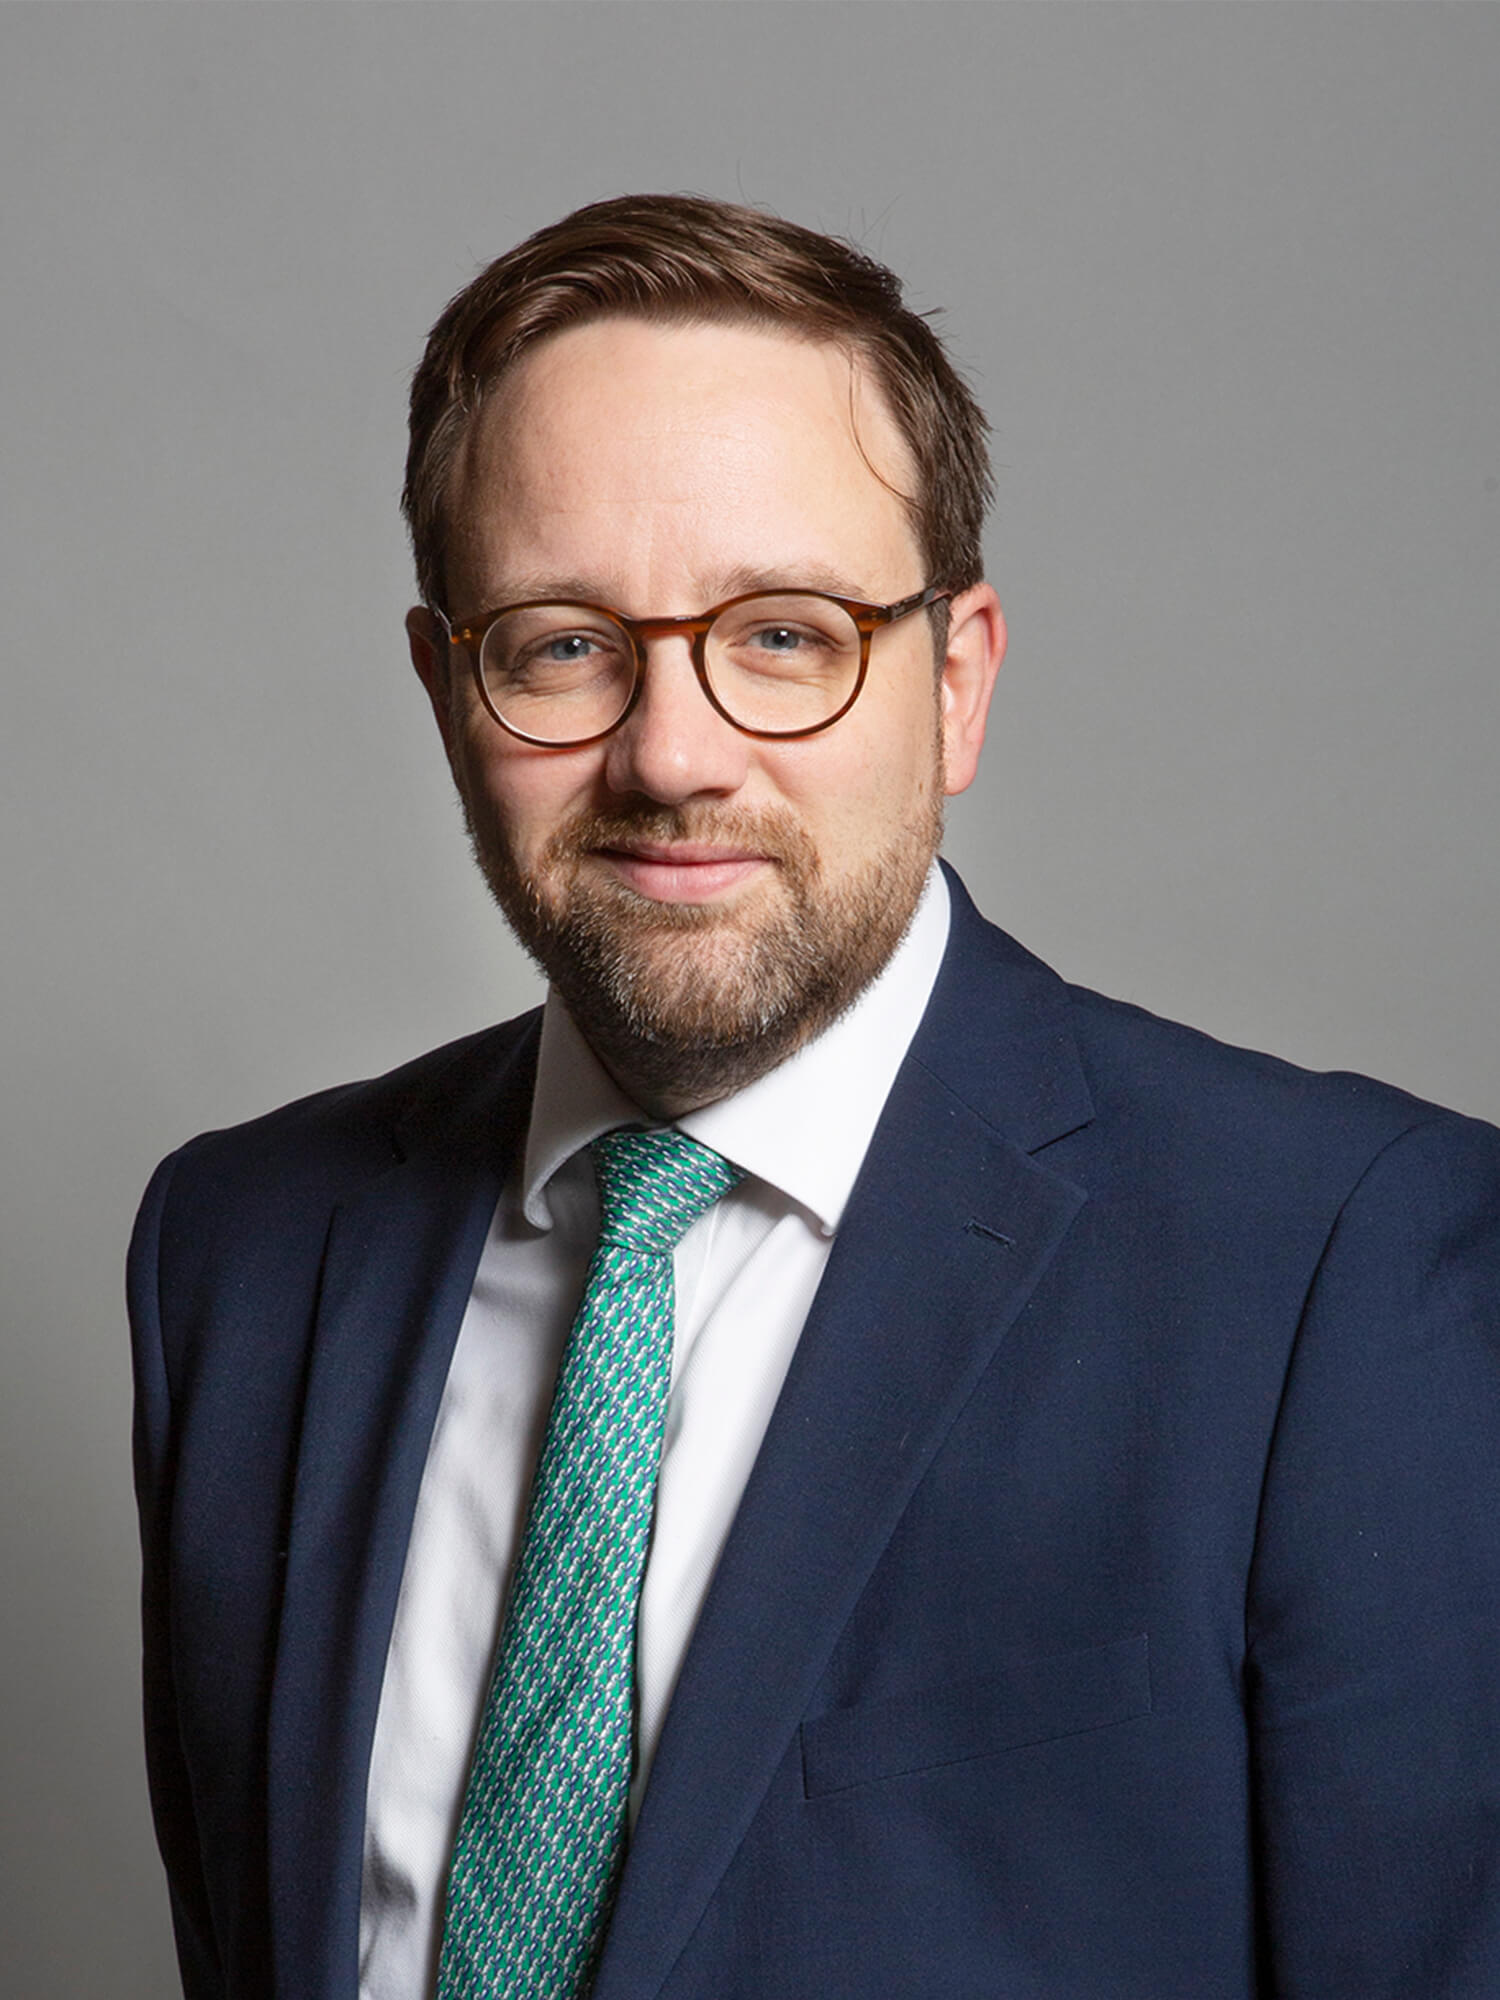 Chris Elmore, MP for Ogmore, Labour Party